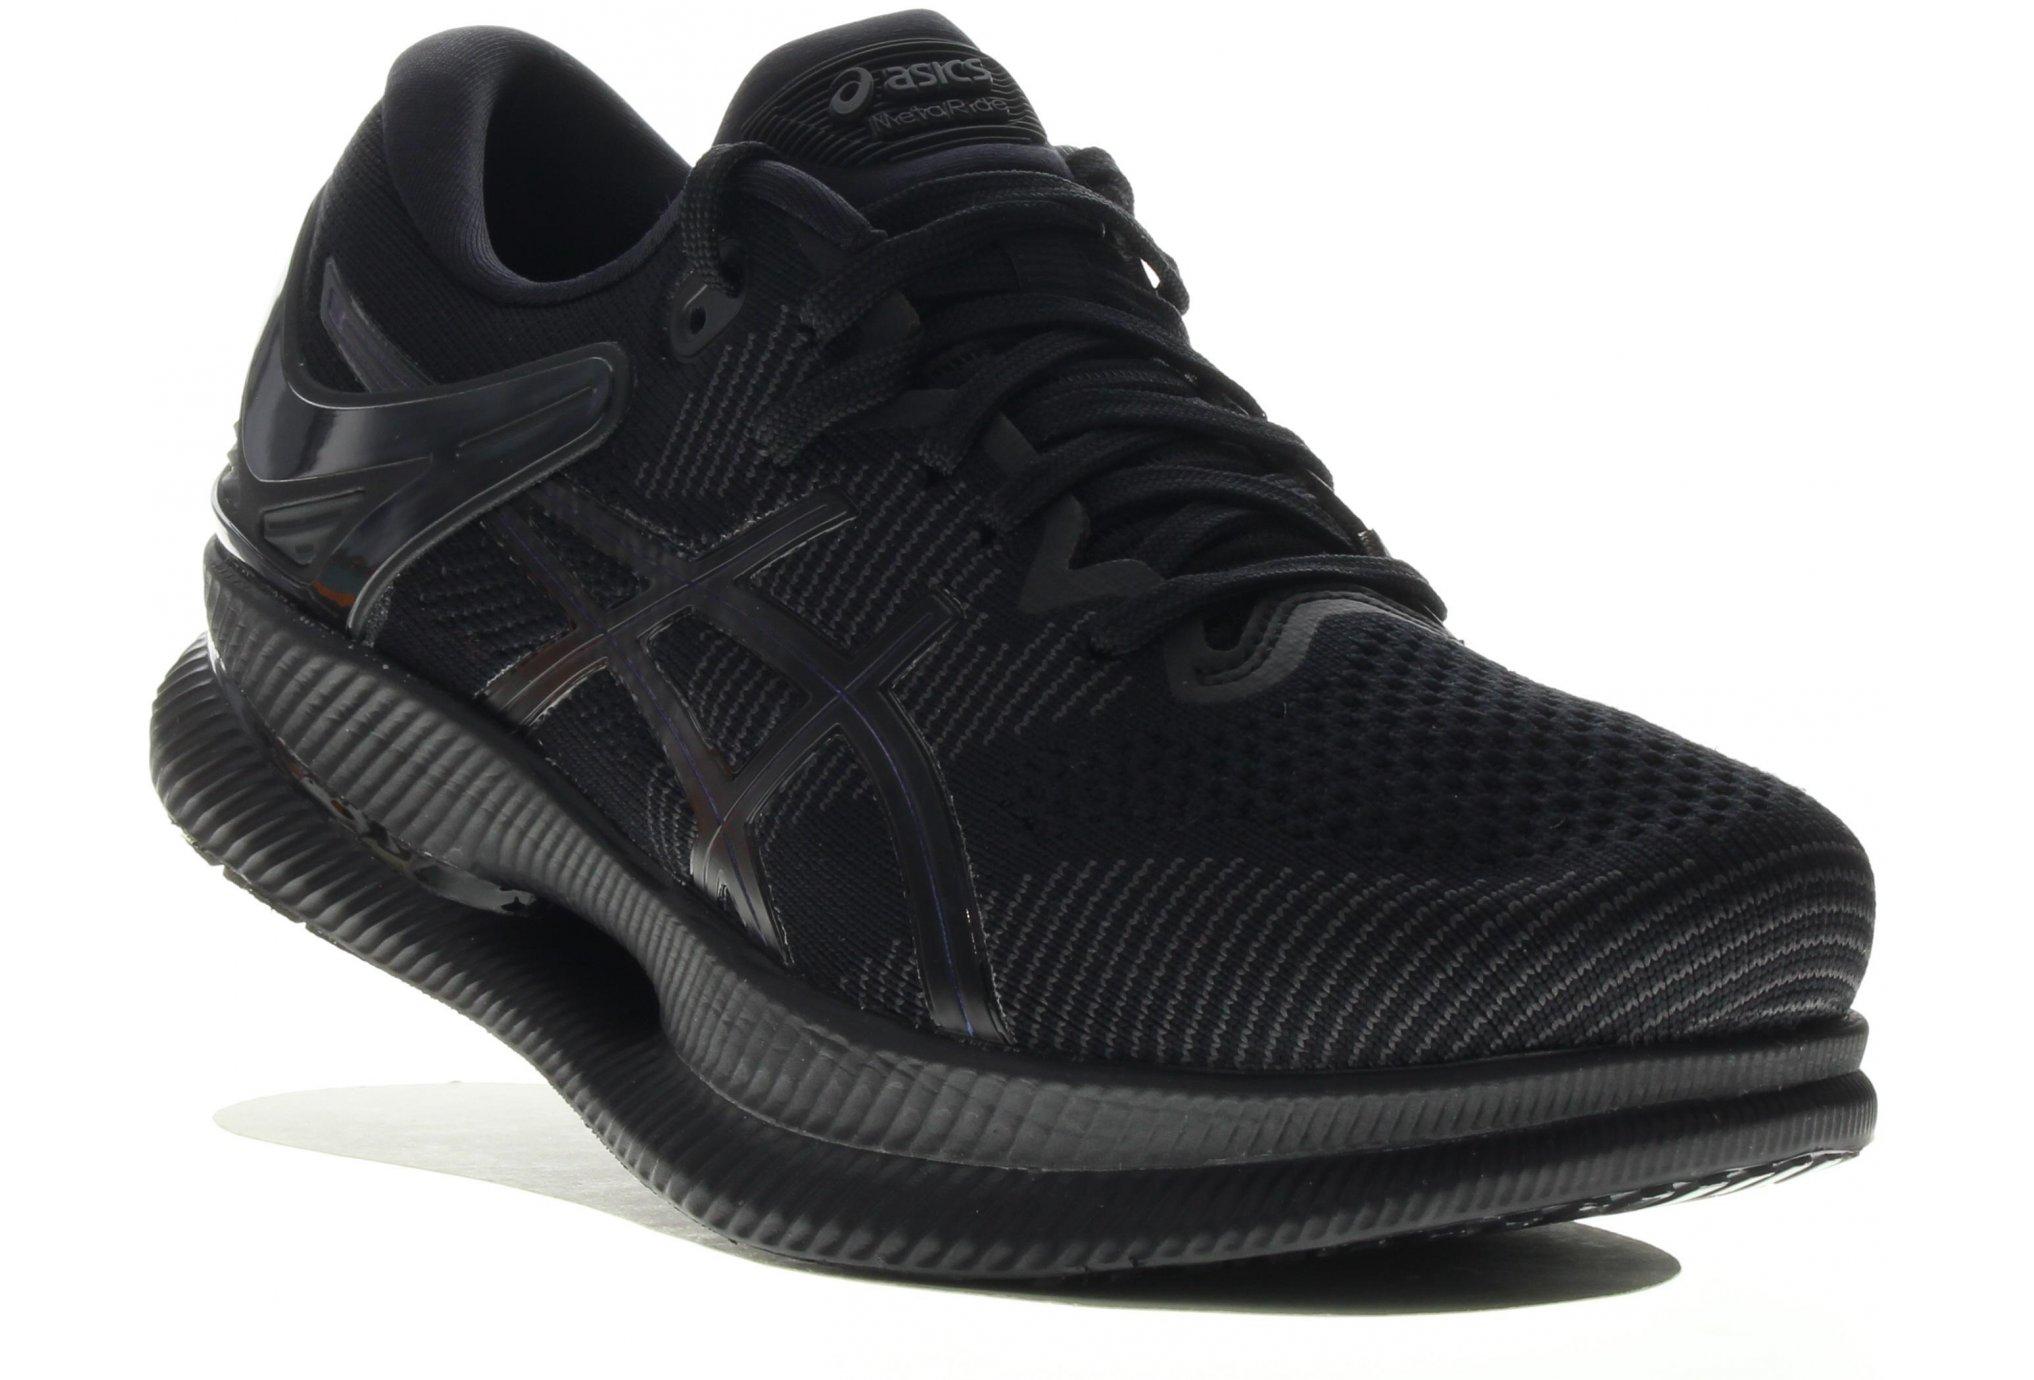 Asics MetaRide Chaussures running femme